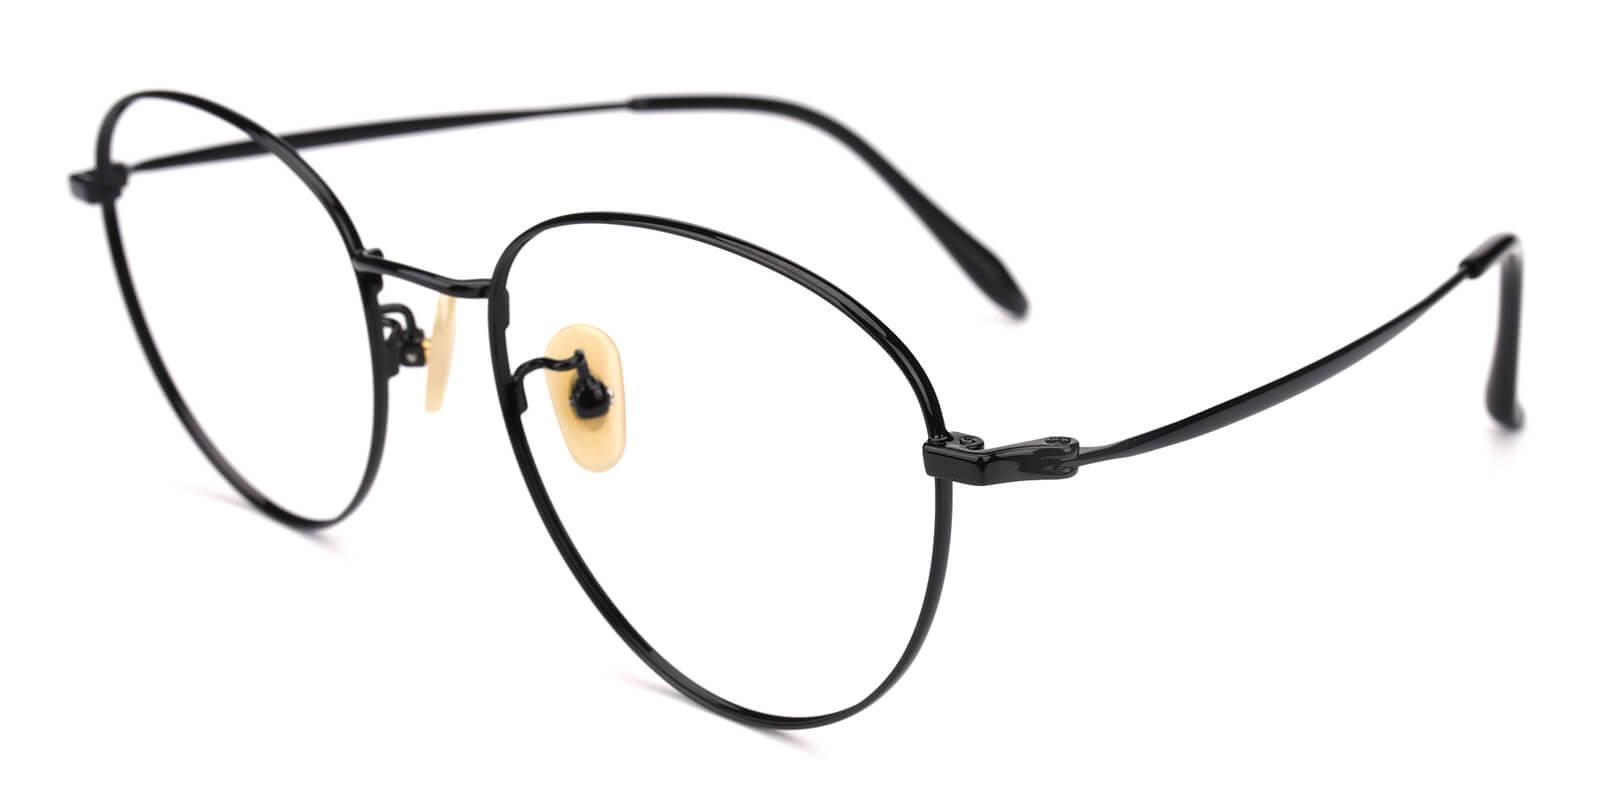 Litteray-Black-Round-Titanium-Eyeglasses-additional1